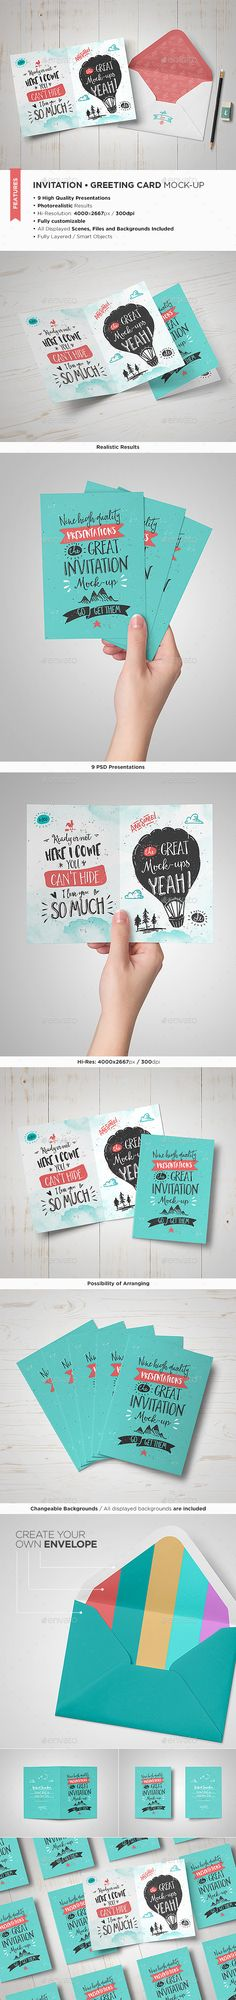 Invitation / Greeting Card Mock-Up #design Download: http://graphicriver.net/item/invitation-greeting-card-mockup/13067421?ref=ksioks